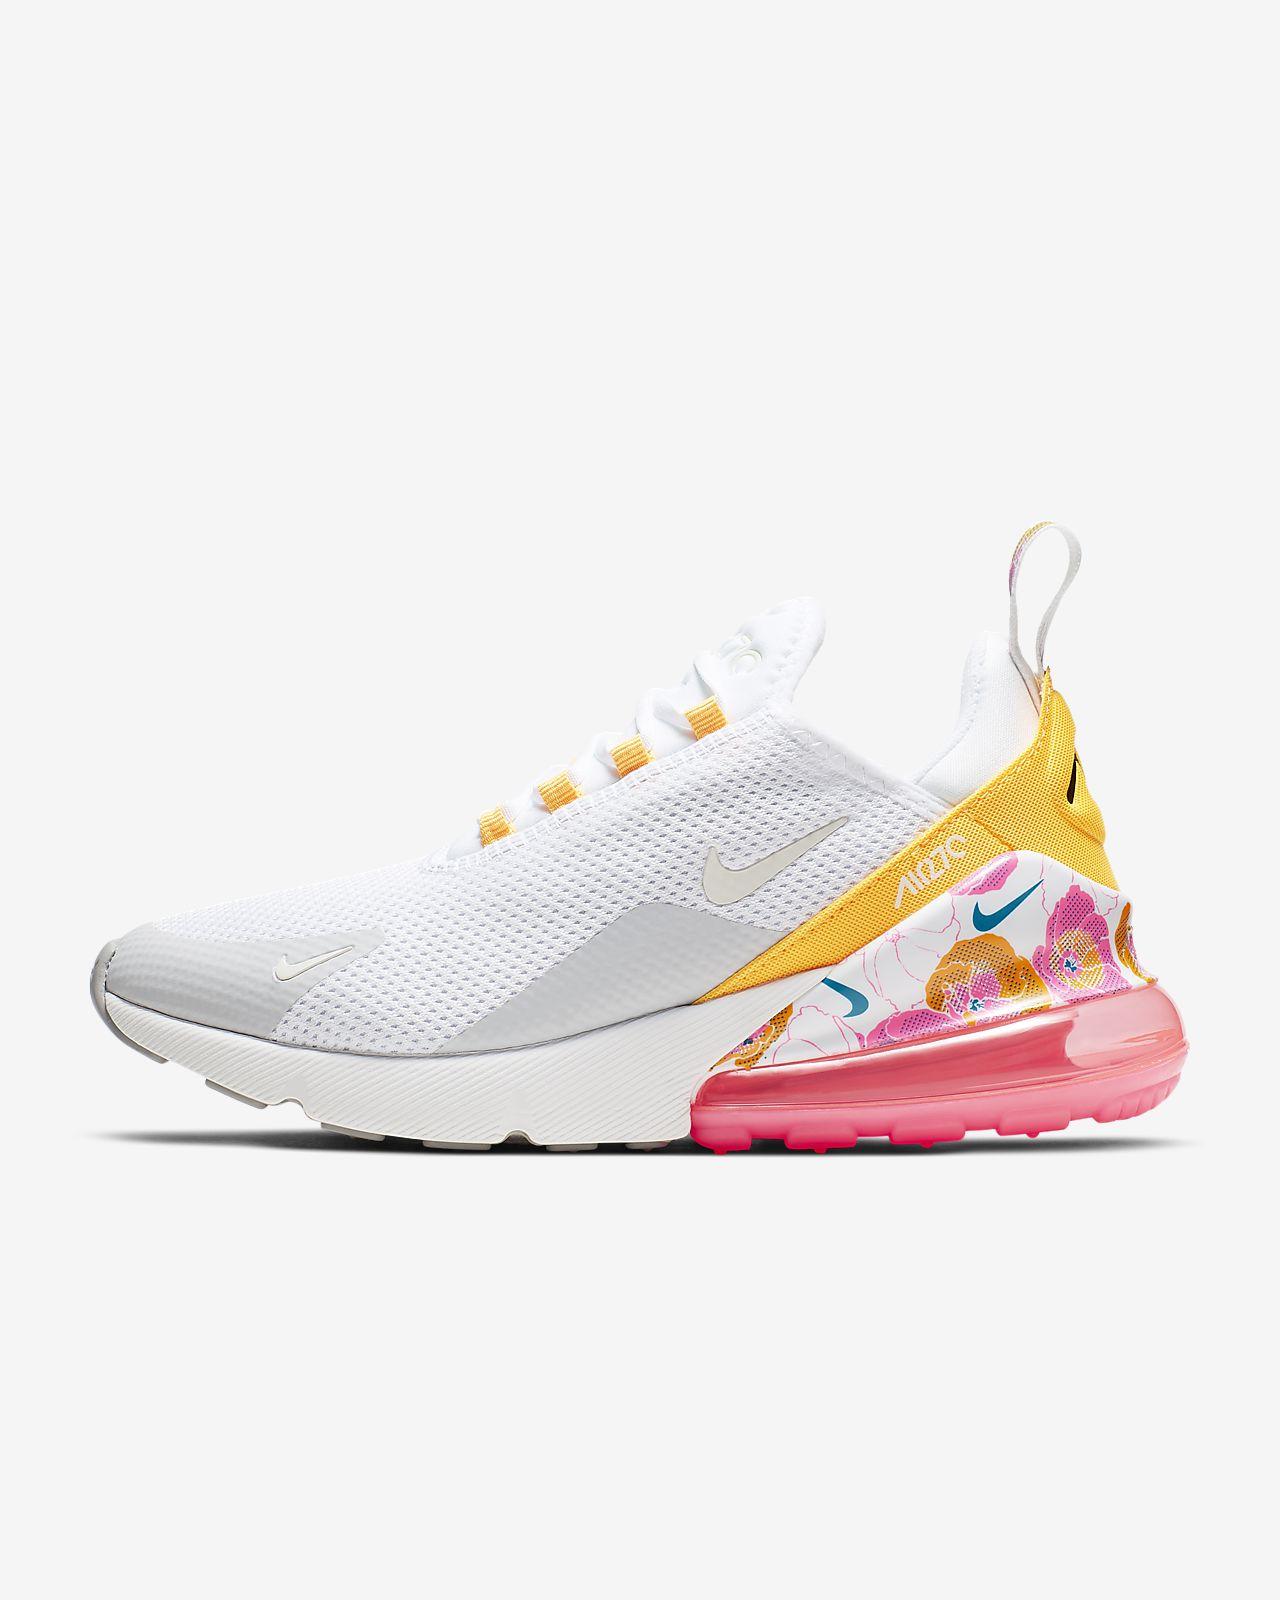 Nike Air Max 270 SE女子运动鞋